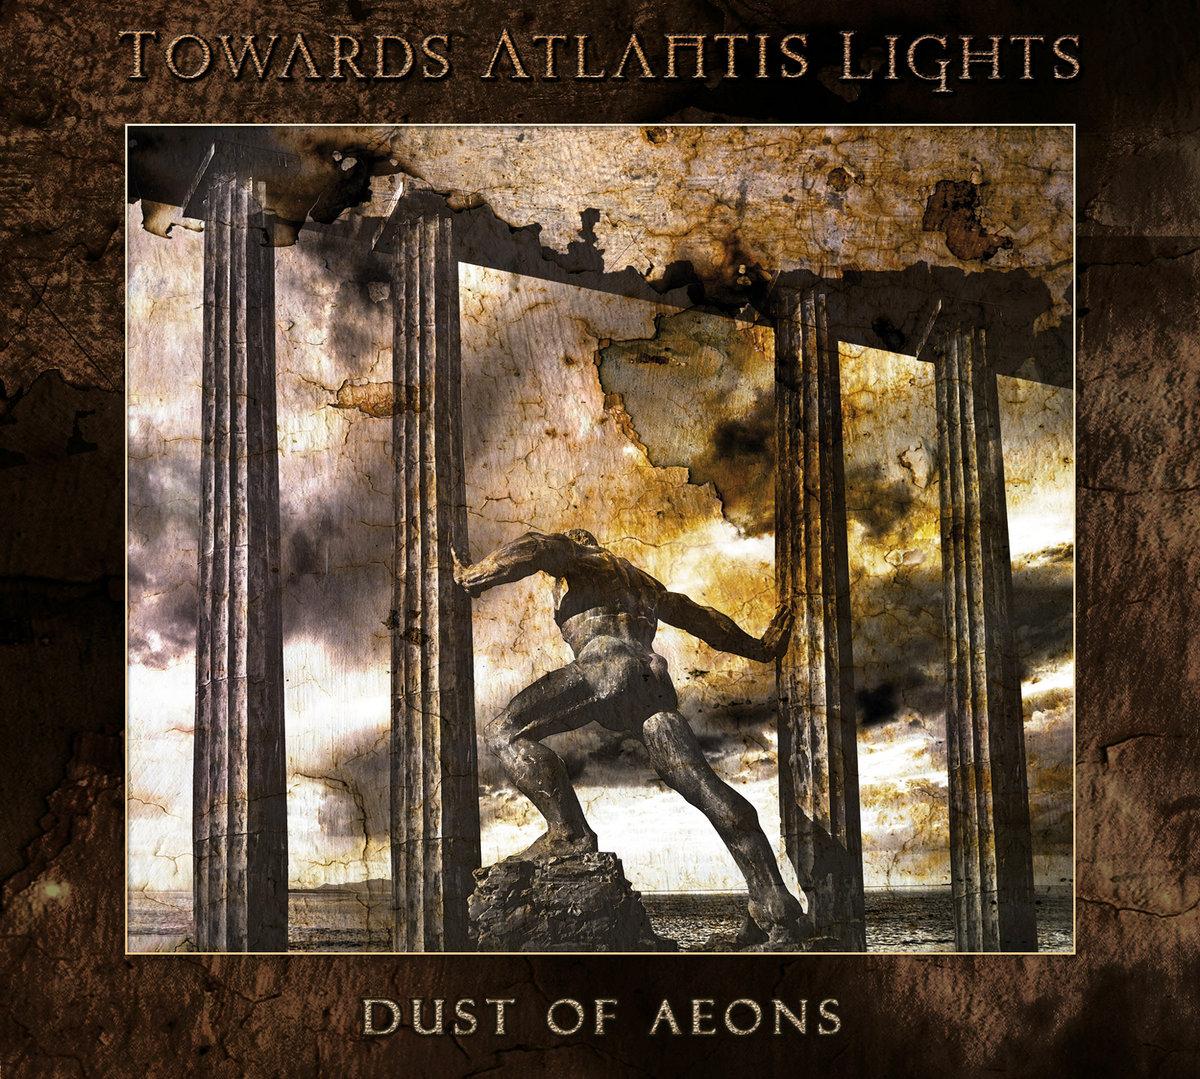 towards atlantis lights – dust of aeons